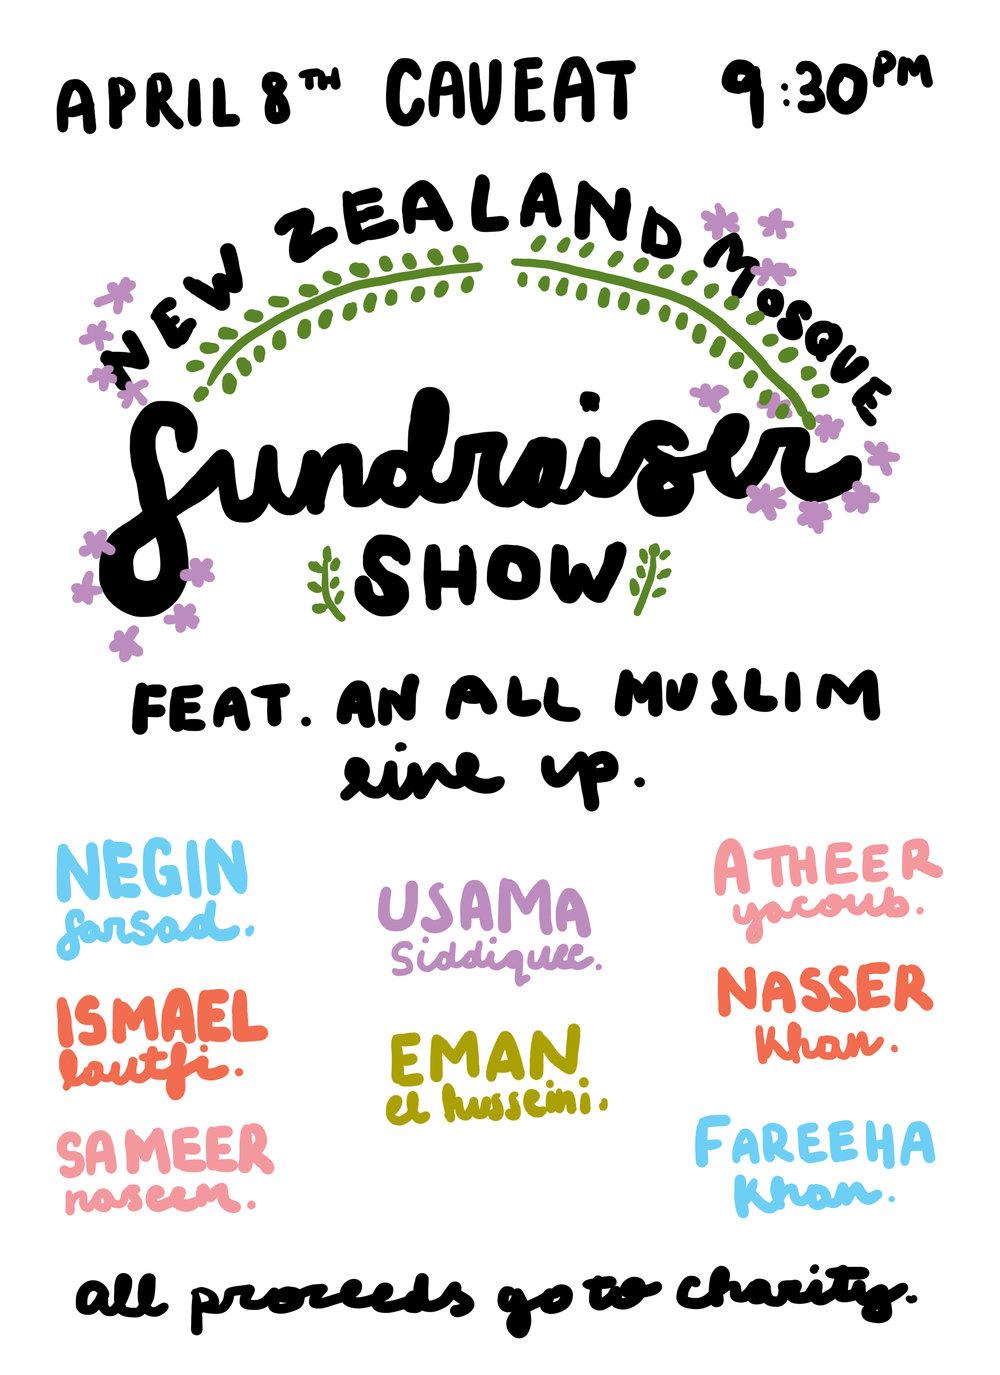 Muslim Fundraiser show.jpg